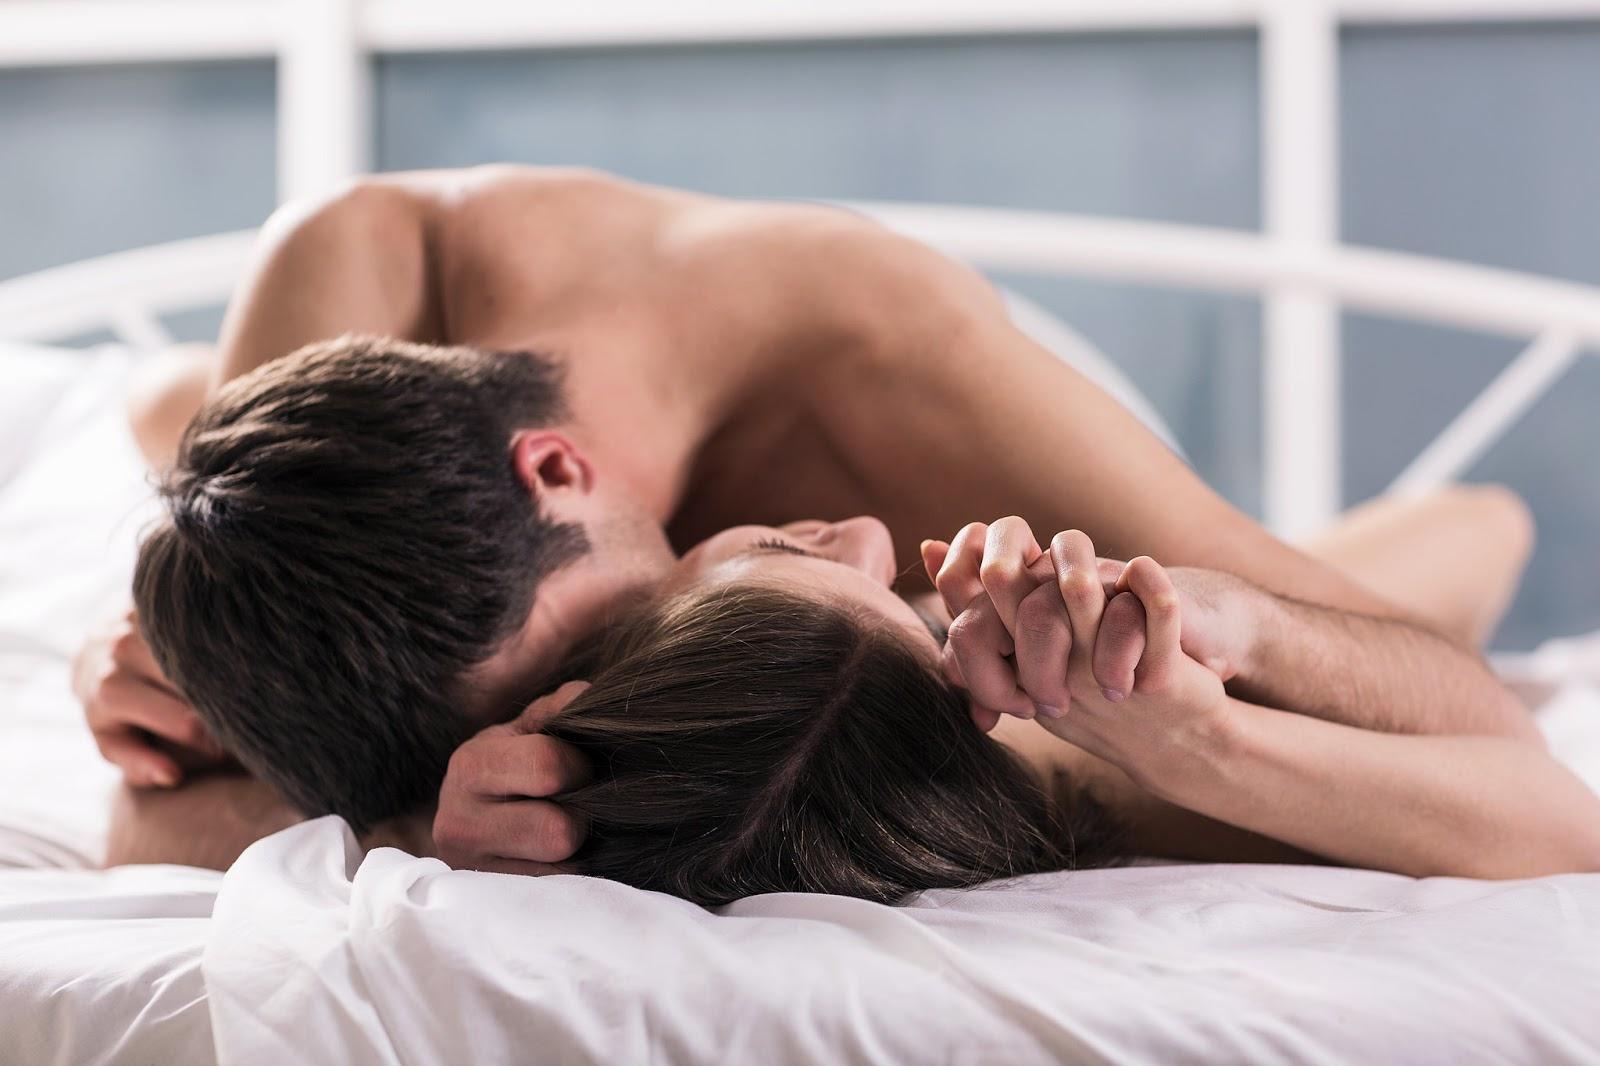 Секс з куни, Порно Куни -видео. Смотреть порно онлайн! 2 фотография